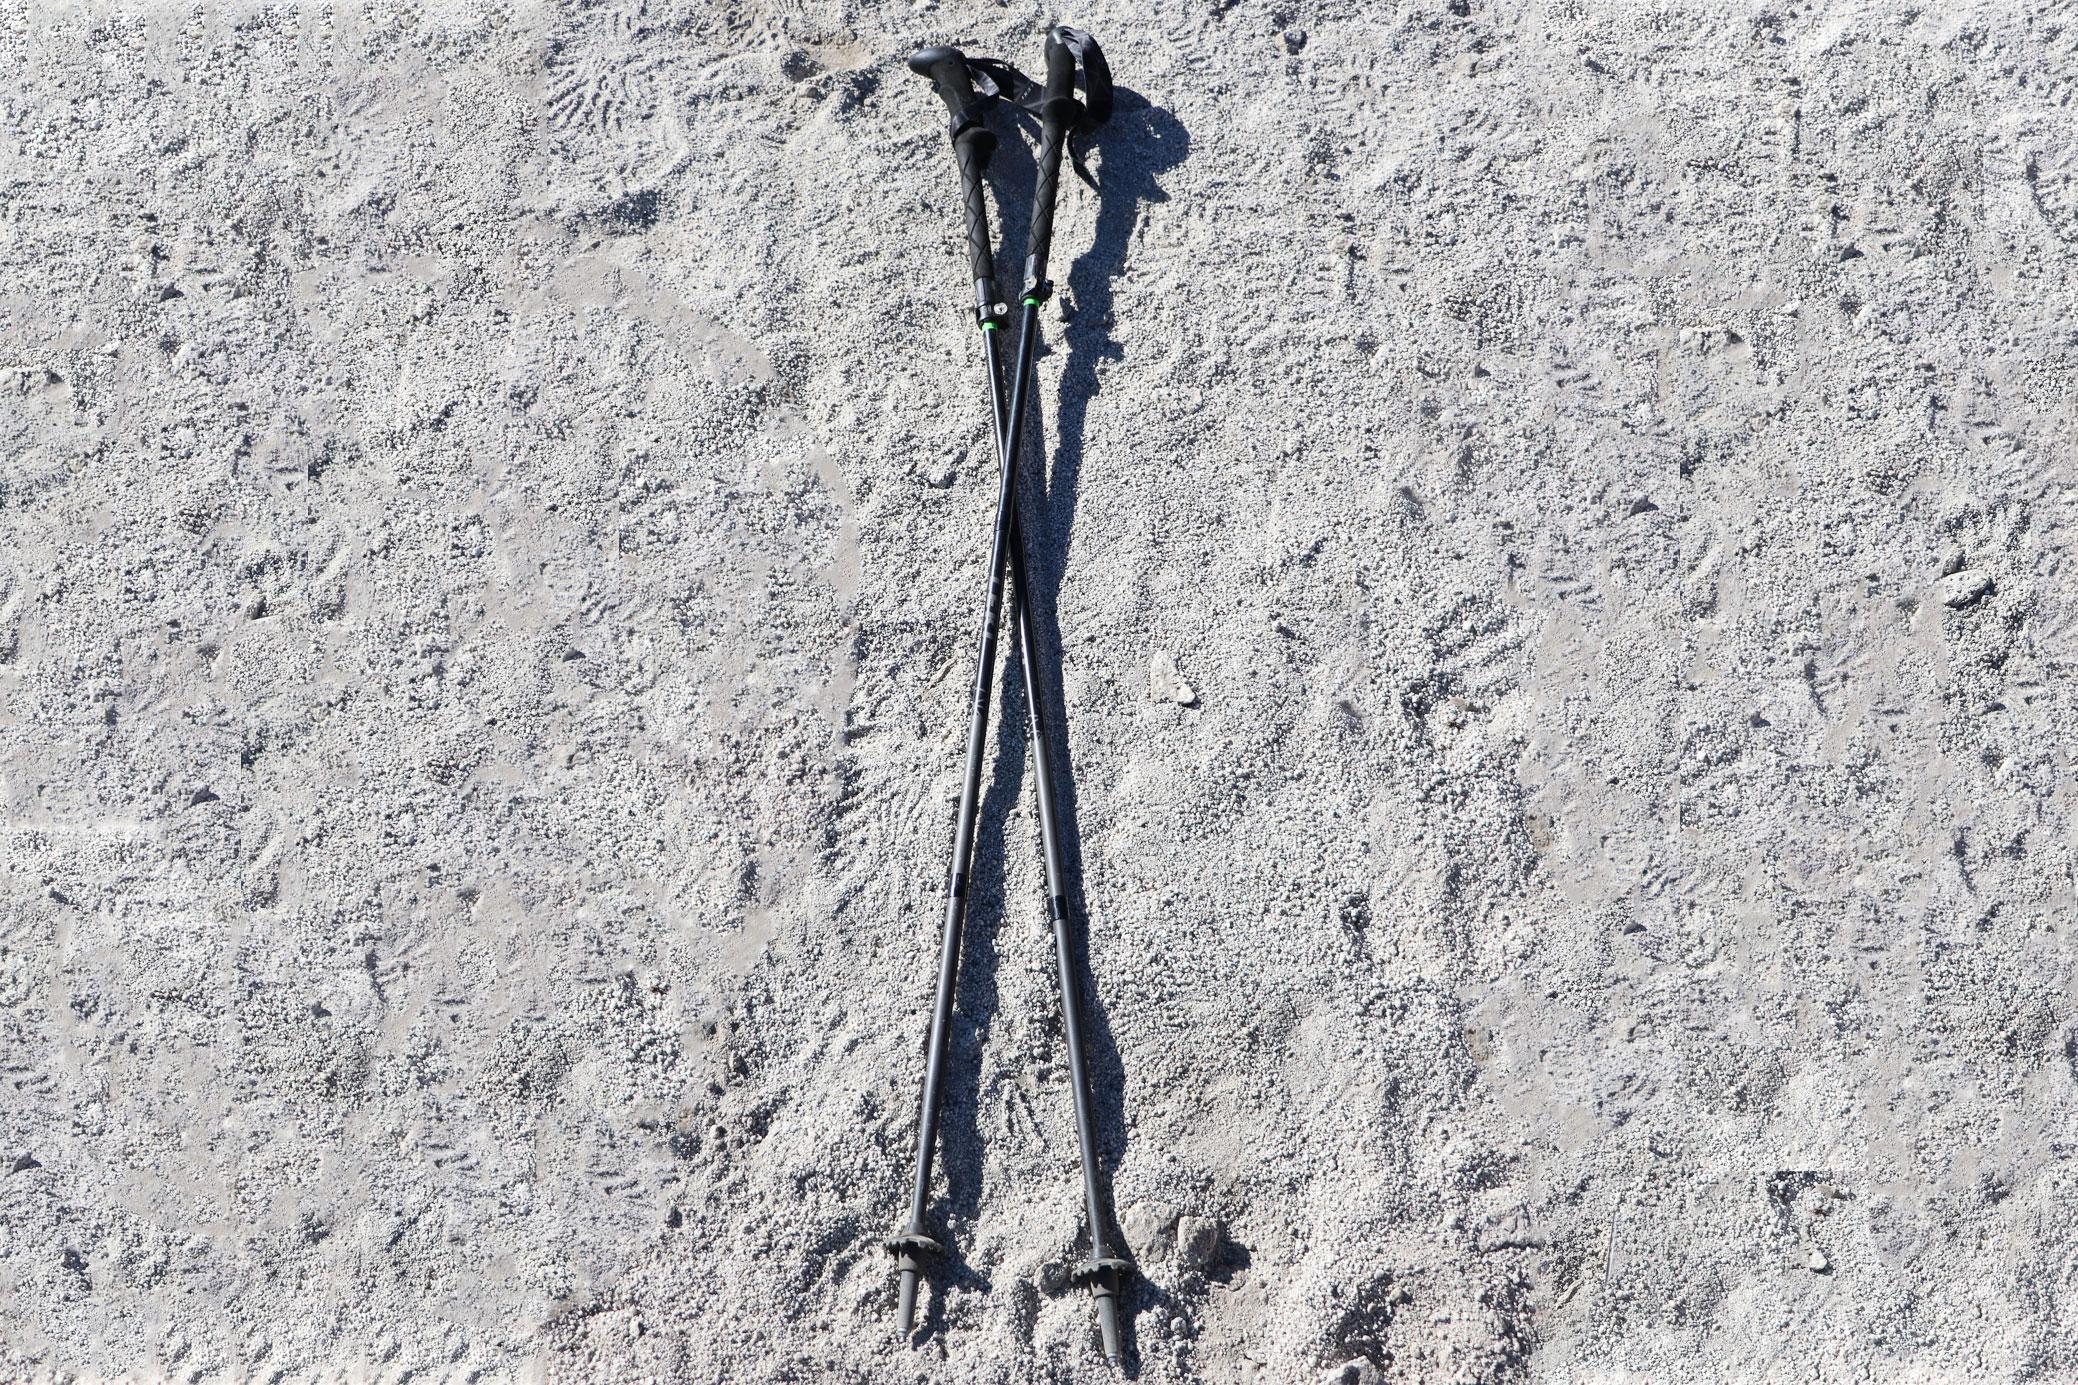 LEKI Micro Vario Carbon Pro Black Series trekking poles